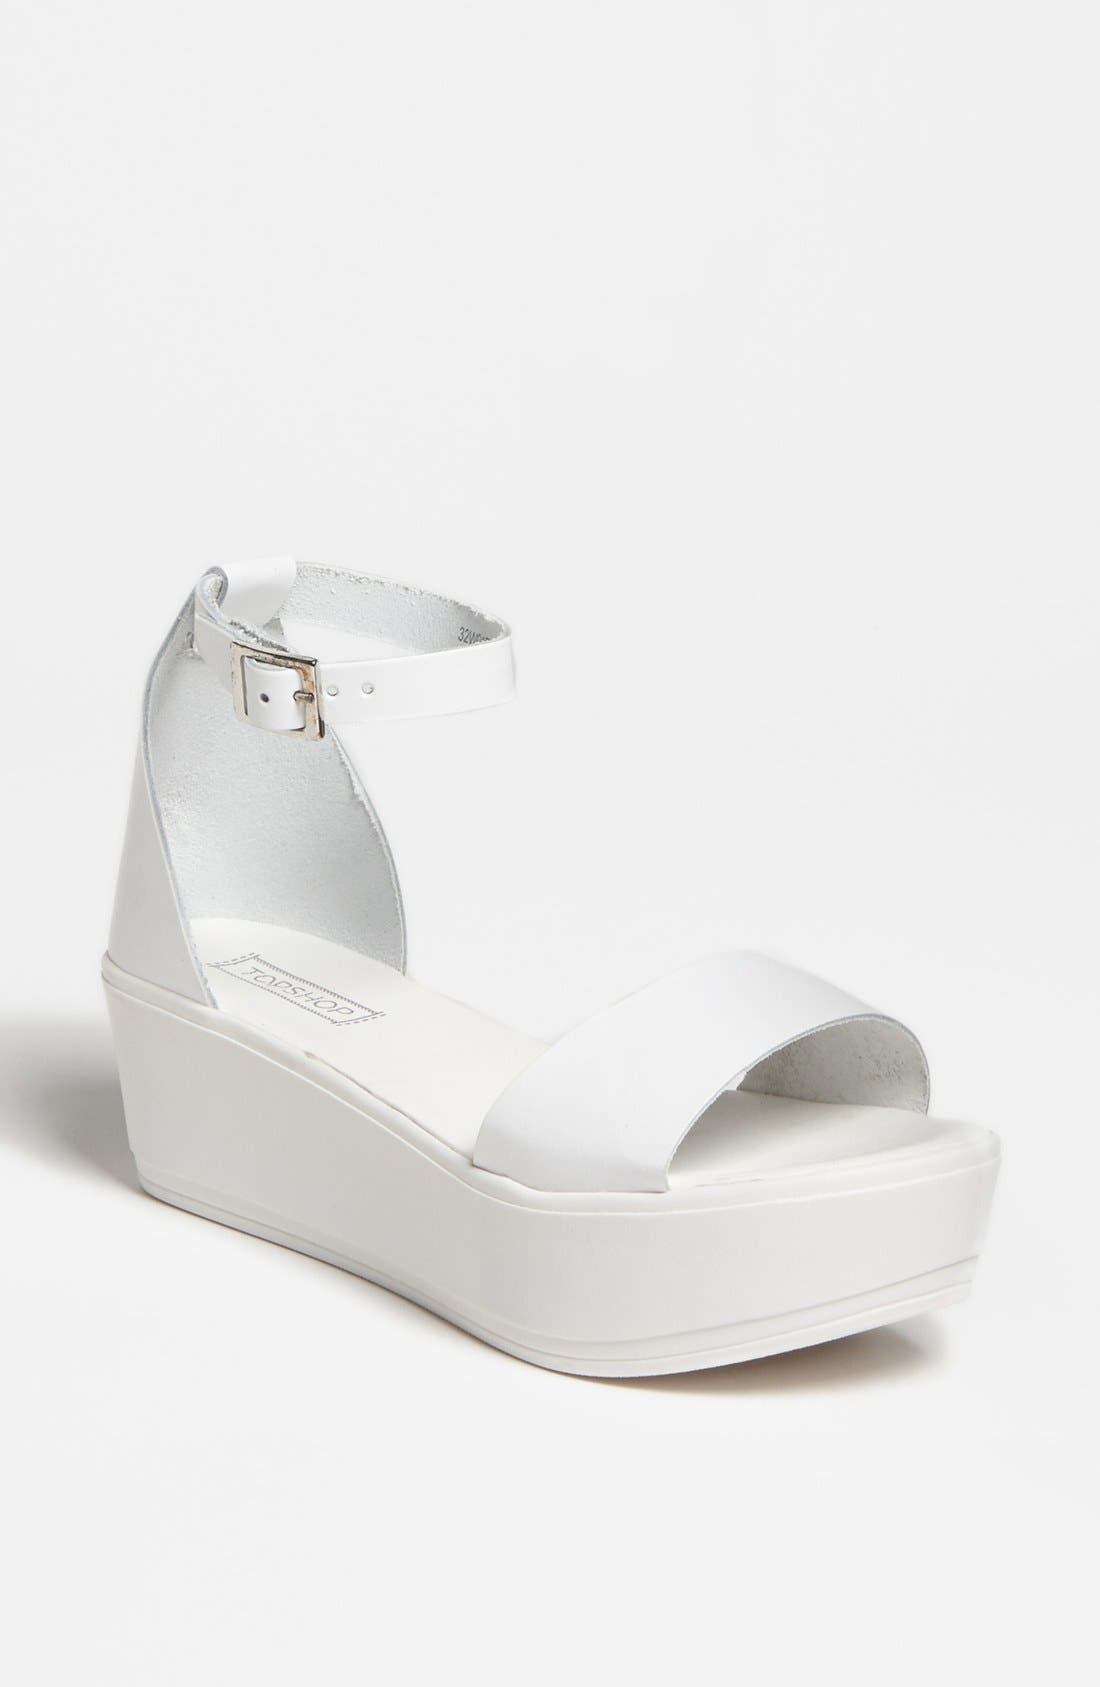 Main Image - Topshop 'Wills' Sandal